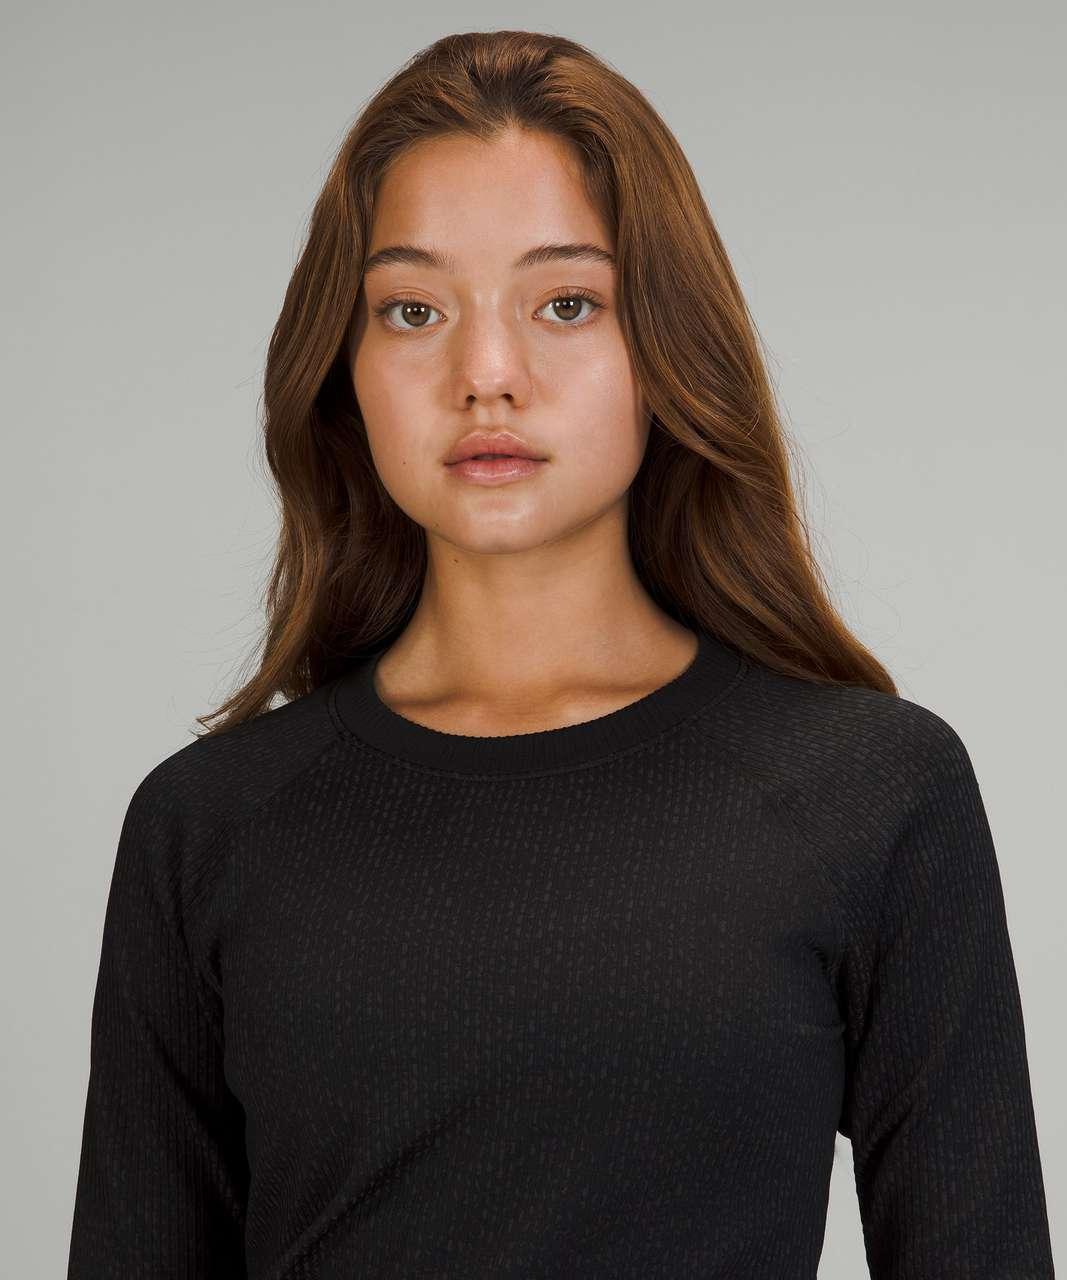 Lululemon Rest Less Pullover - Texture Grid Black / Graphite Grey